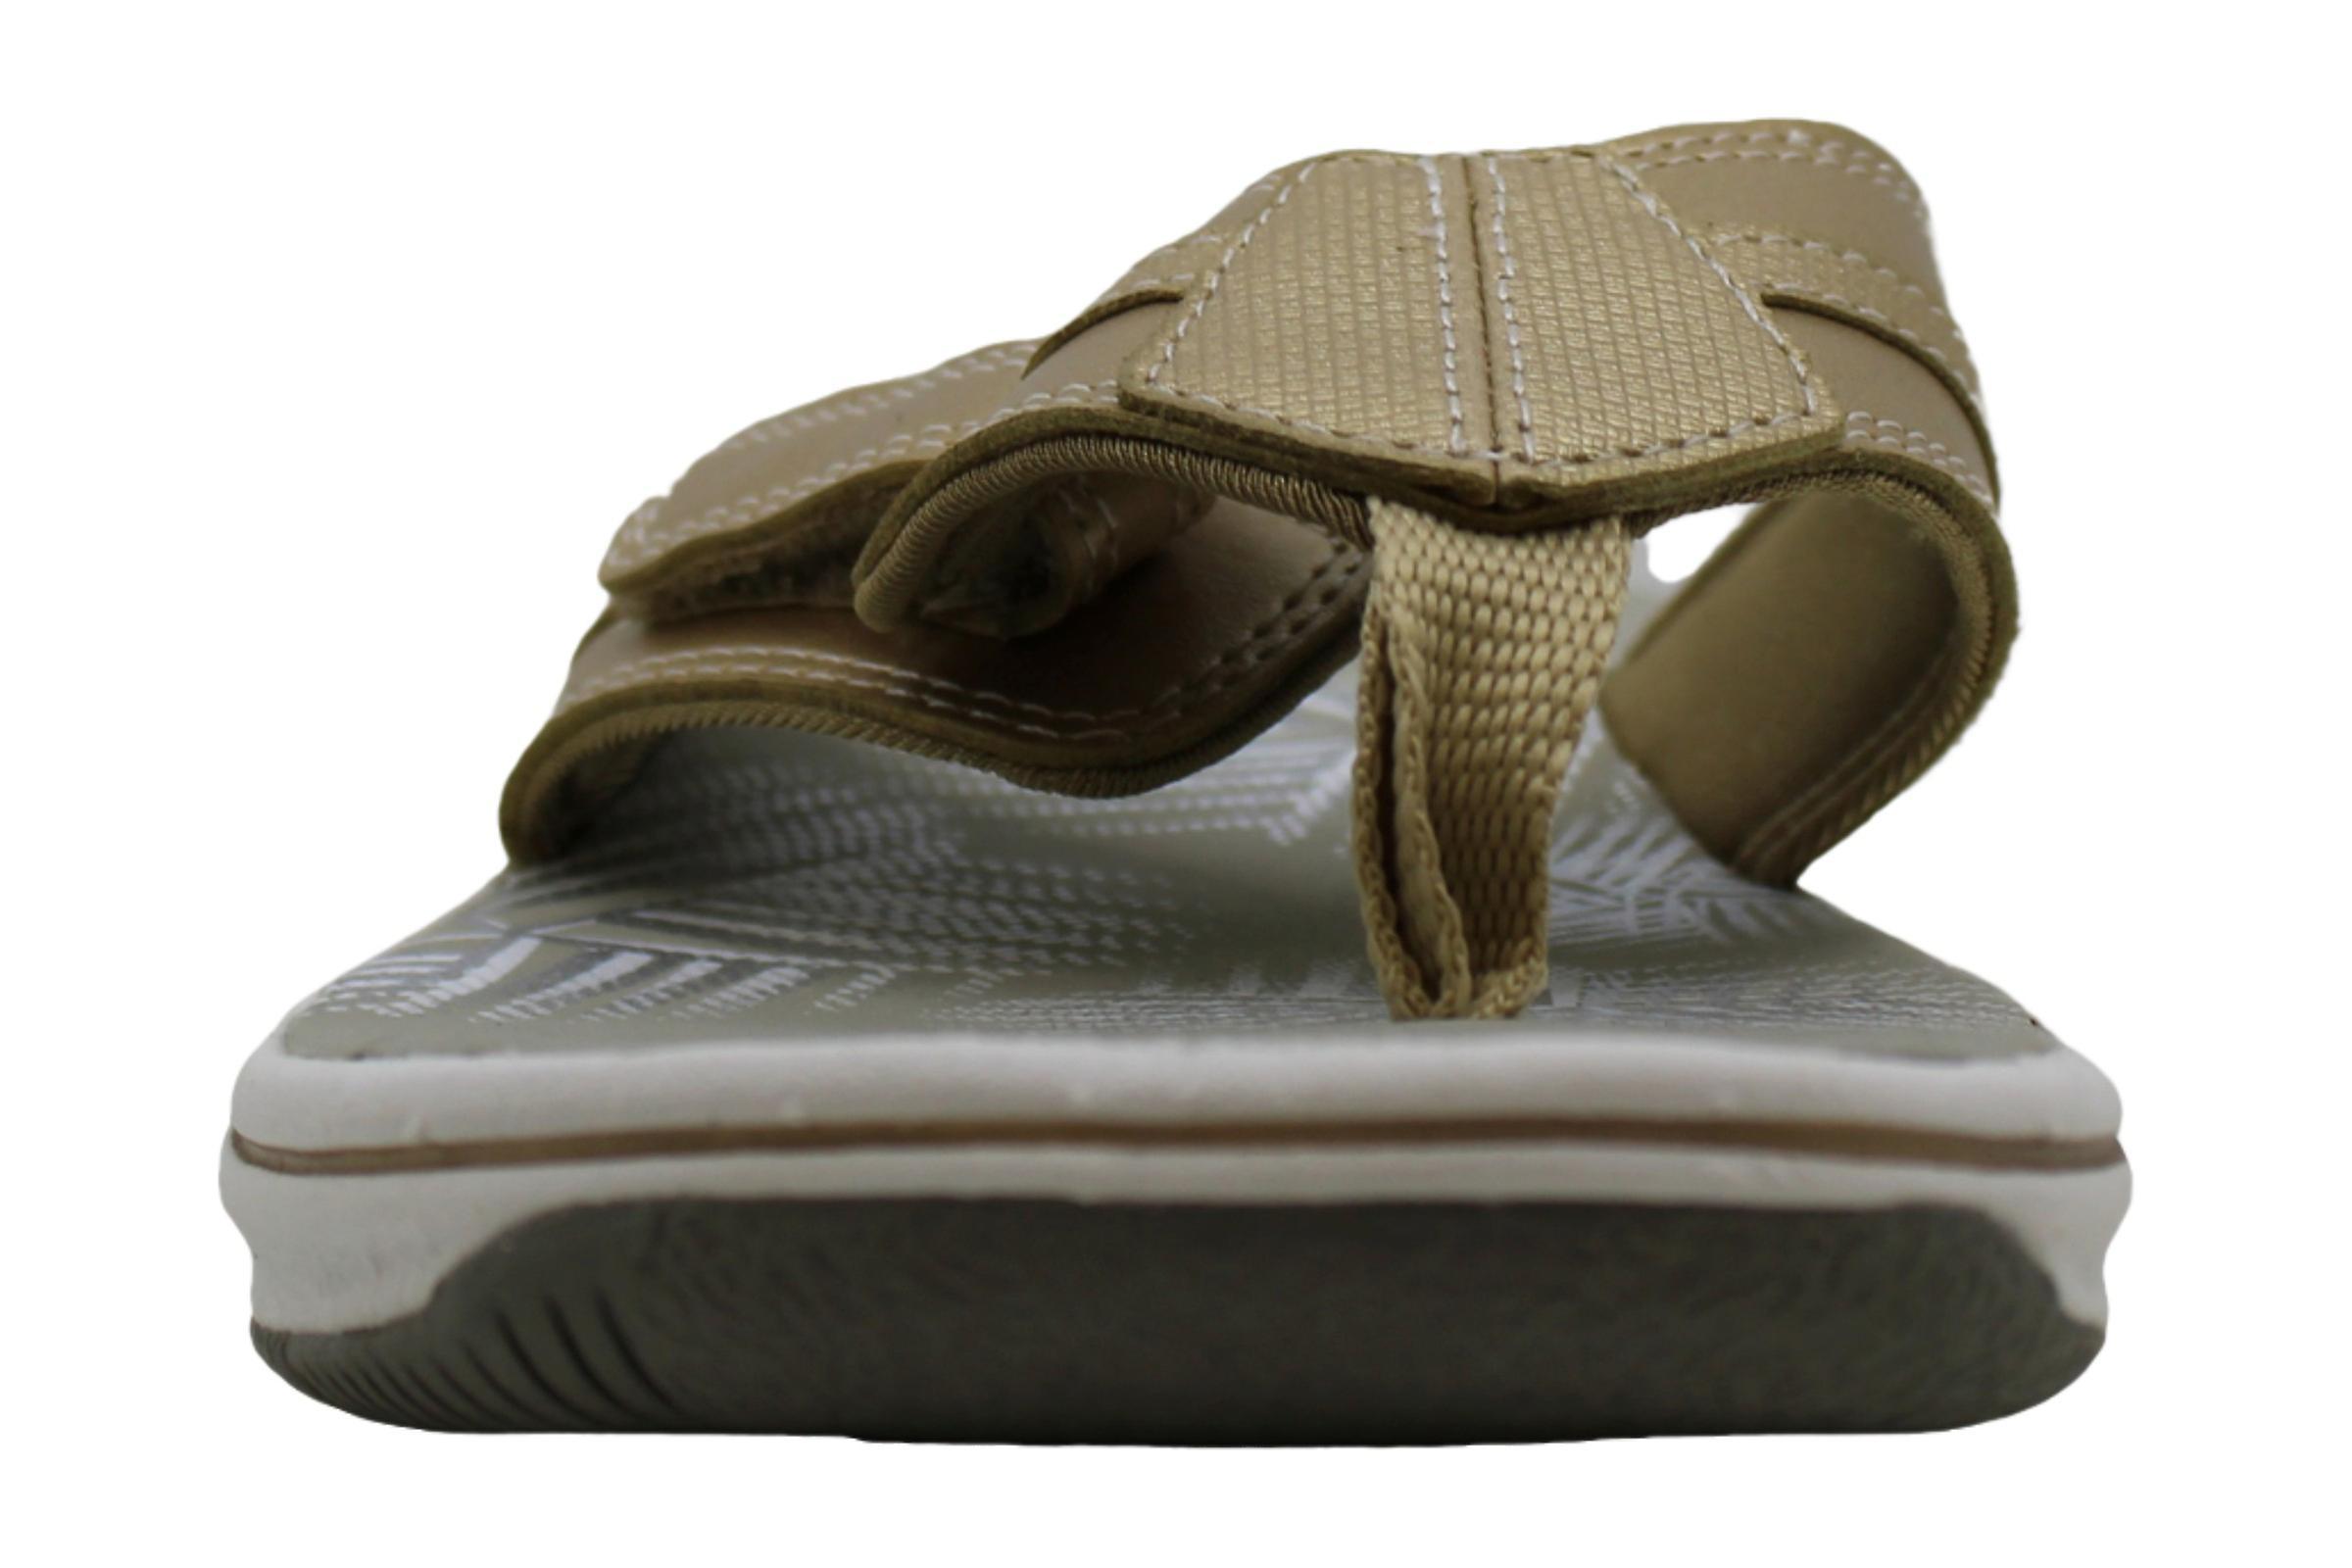 CLARKS Womens Brinkley Bree Faux Leather Thong Flip-Flops Yellow 6 Medium (B,M)